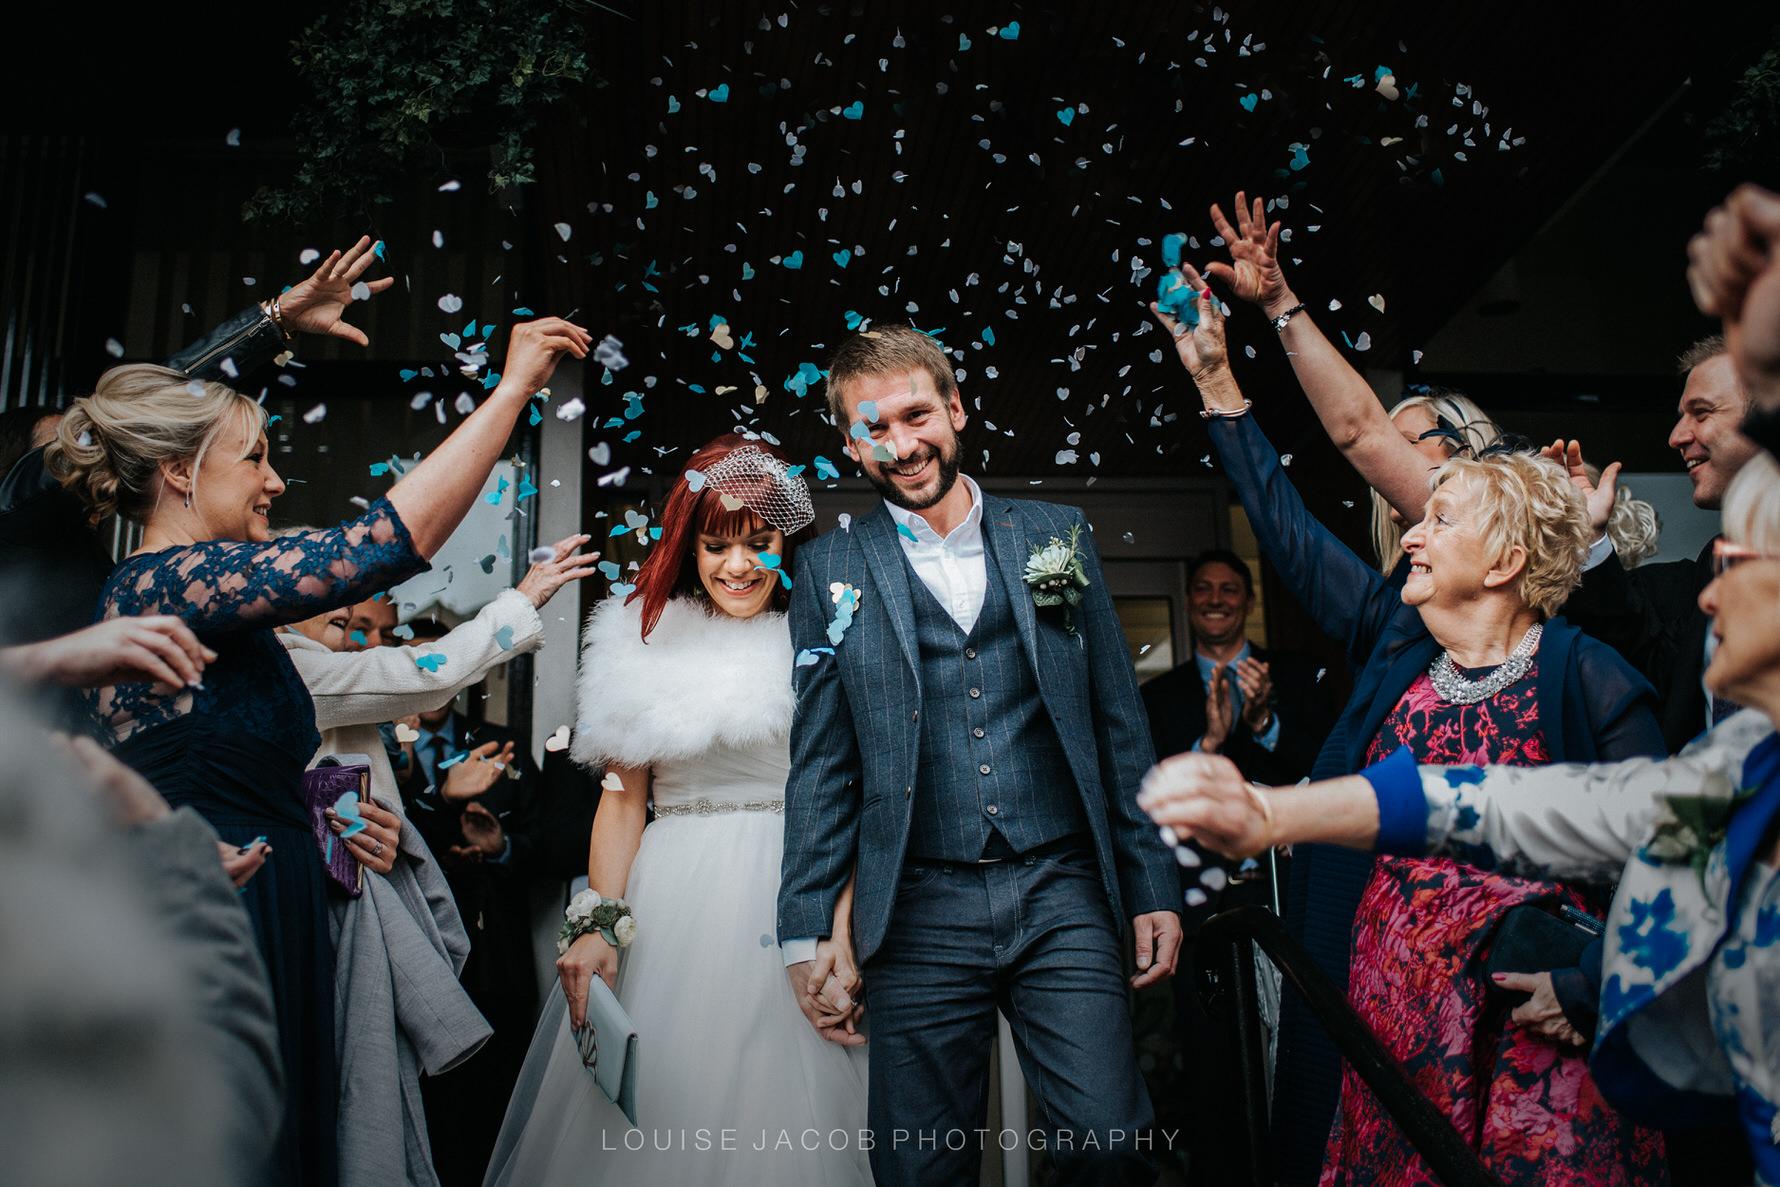 Wedding Photojournalism - the confetti shot